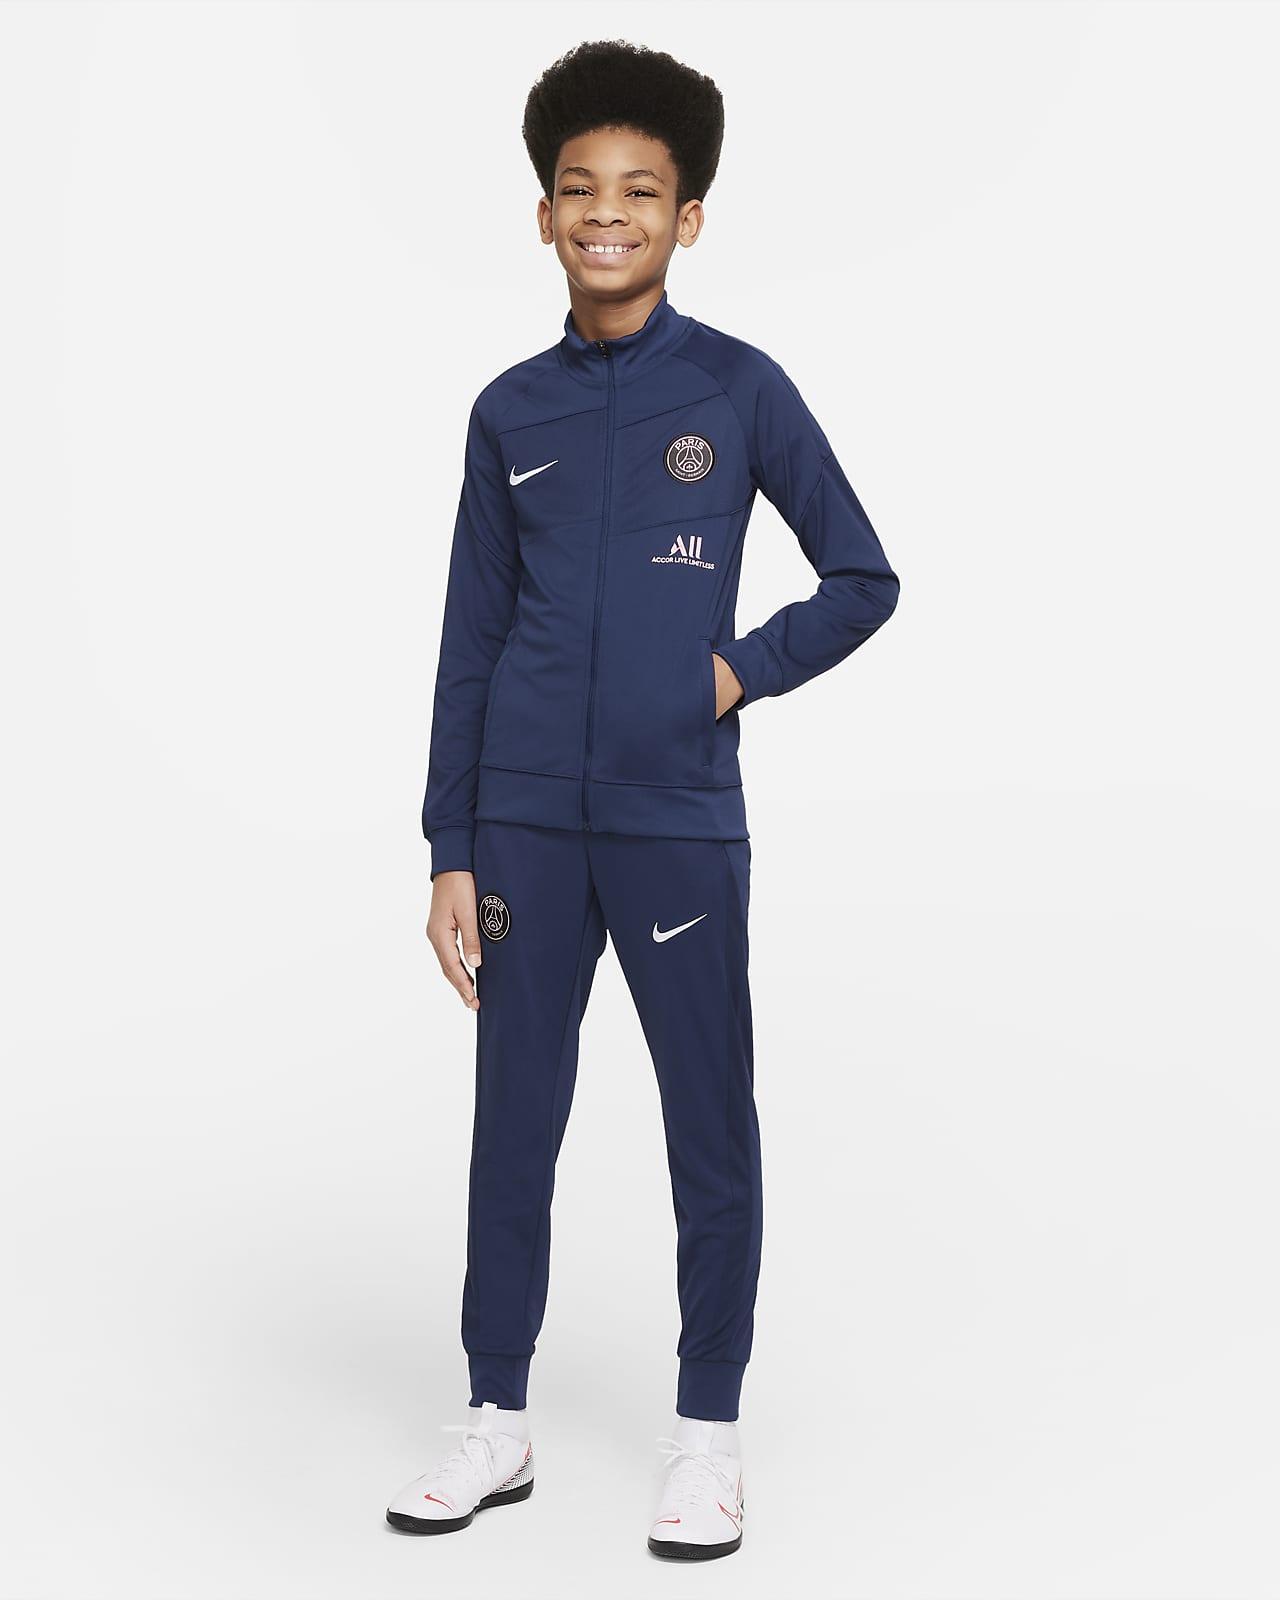 Fato de treino de futebol Nike Dri-FIT Academy Pro Paris Saint-Germain Júnior